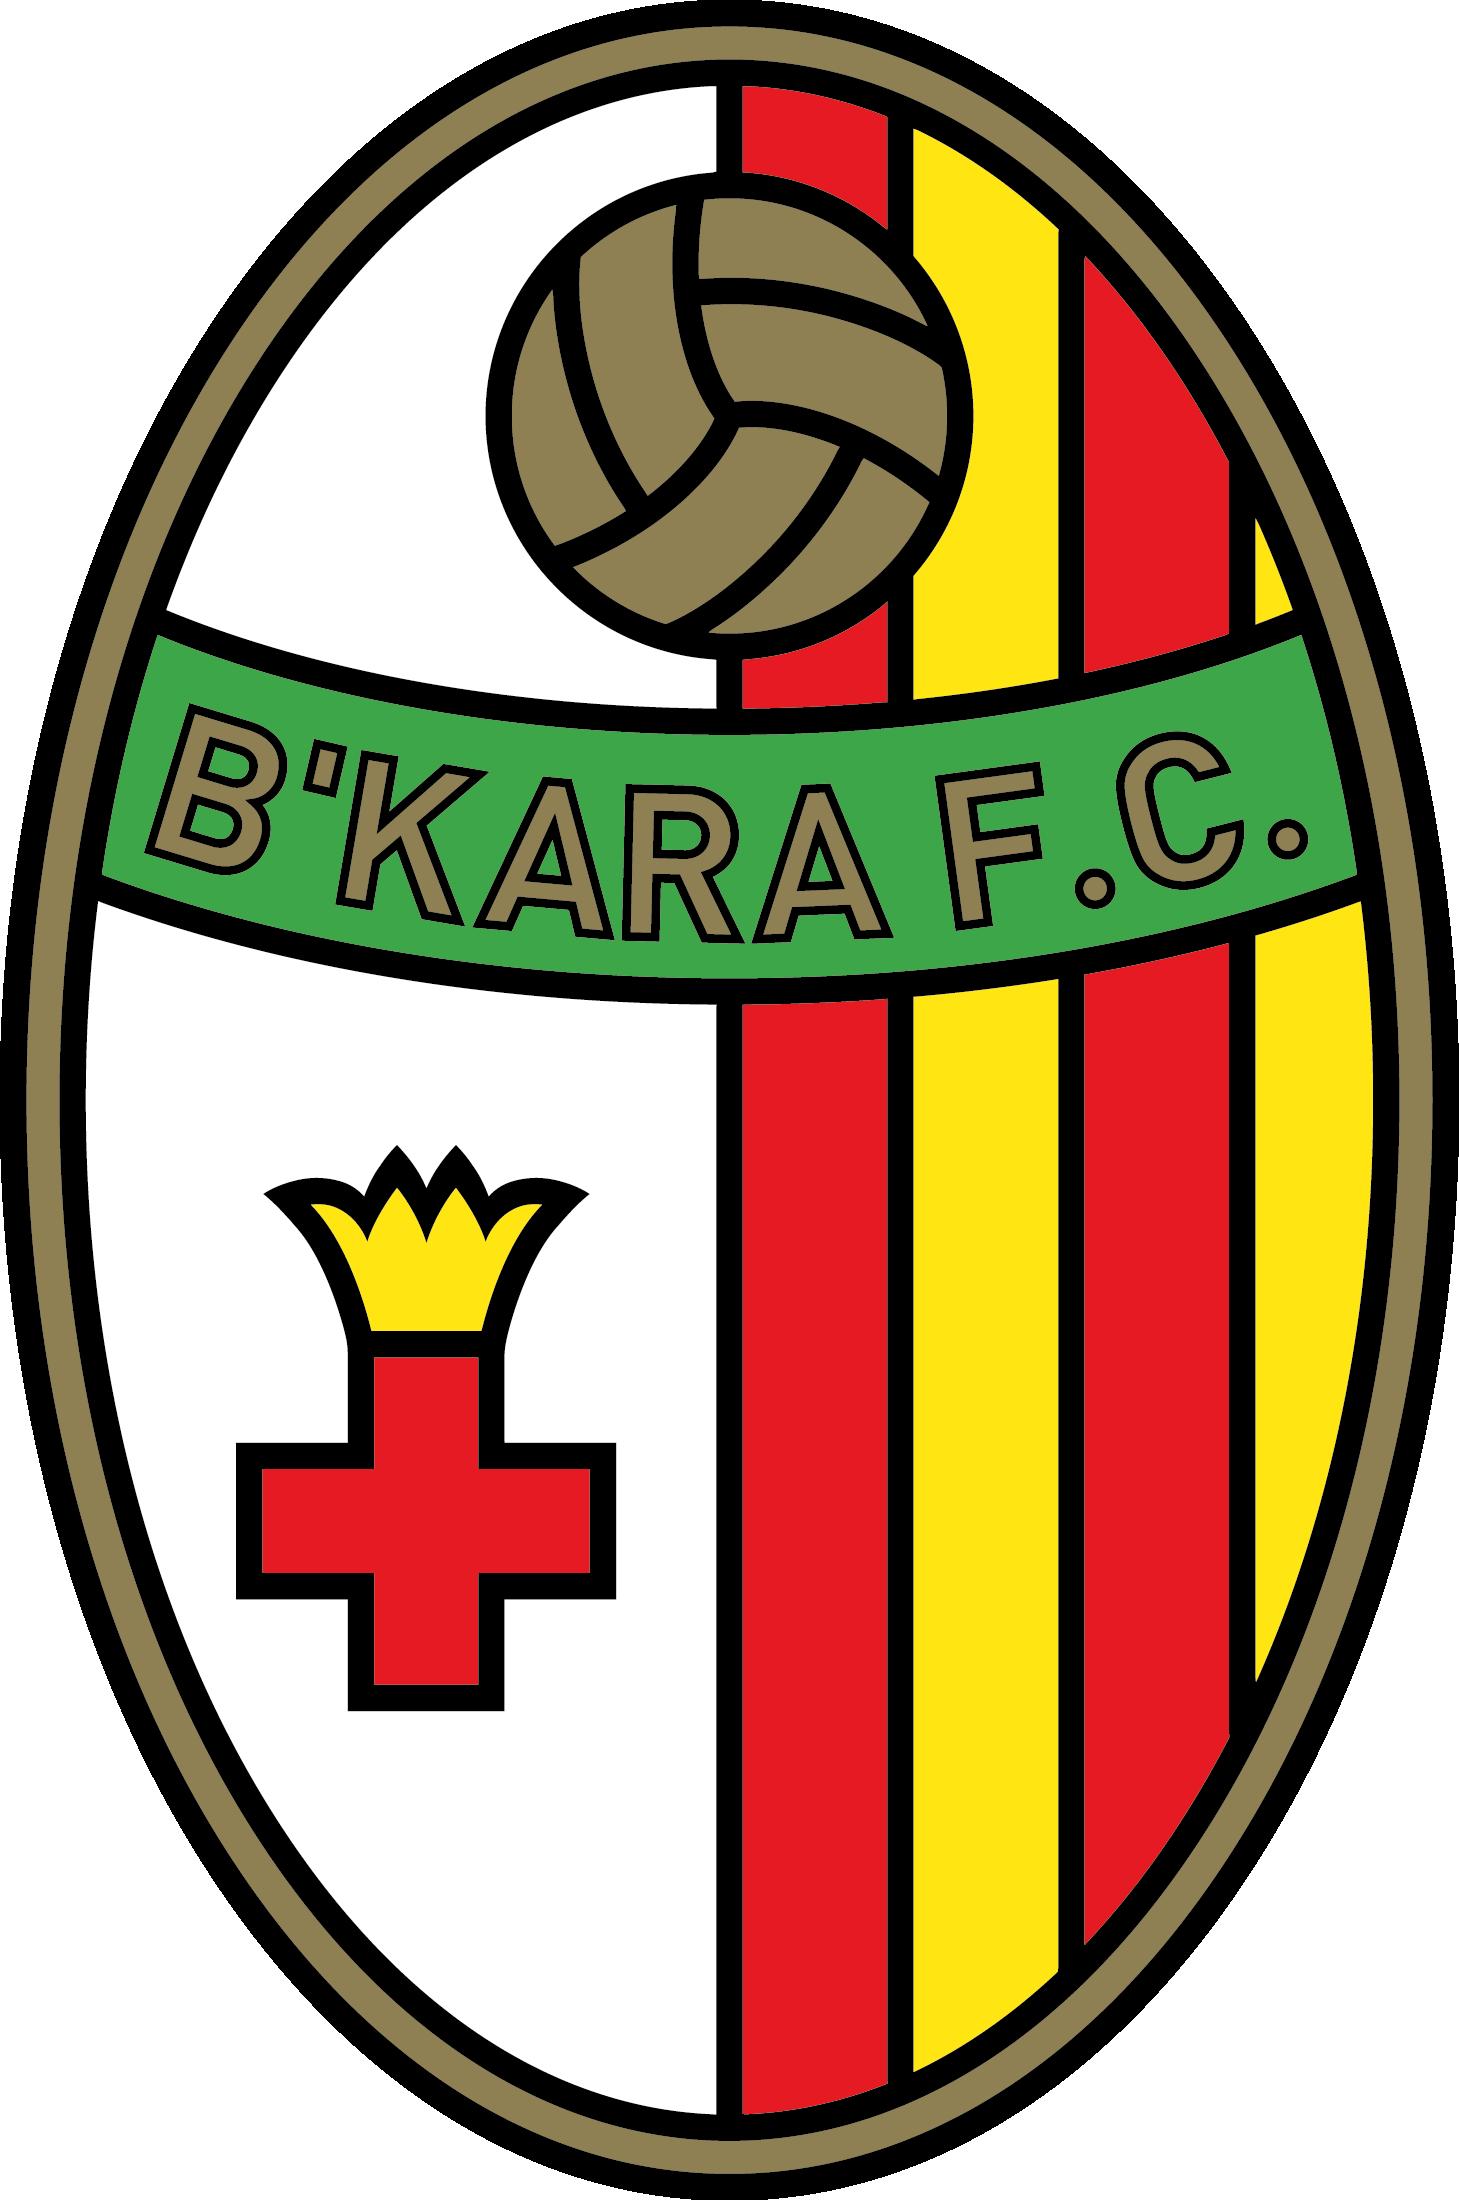 Dallas cowboys clipart badge. Birkirkara fc football logos